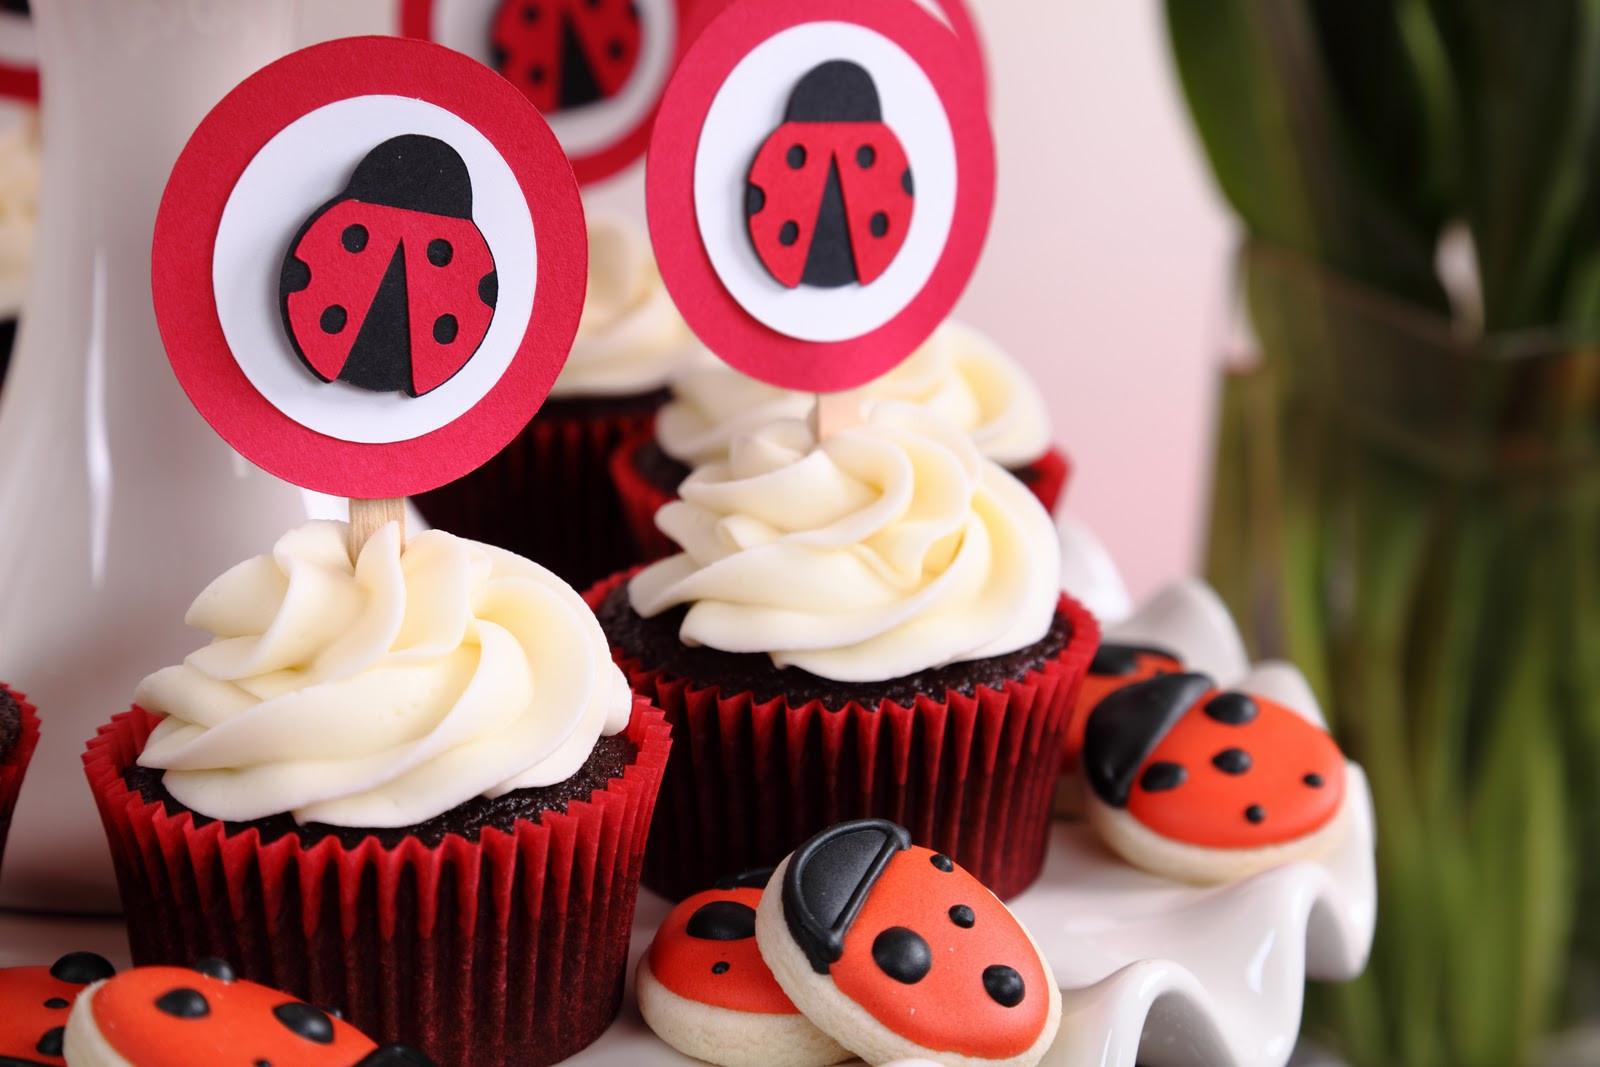 Best ideas about Ladybug Birthday Decorations . Save or Pin Joy's Ladybug Birthday – Glorious Treats Now.